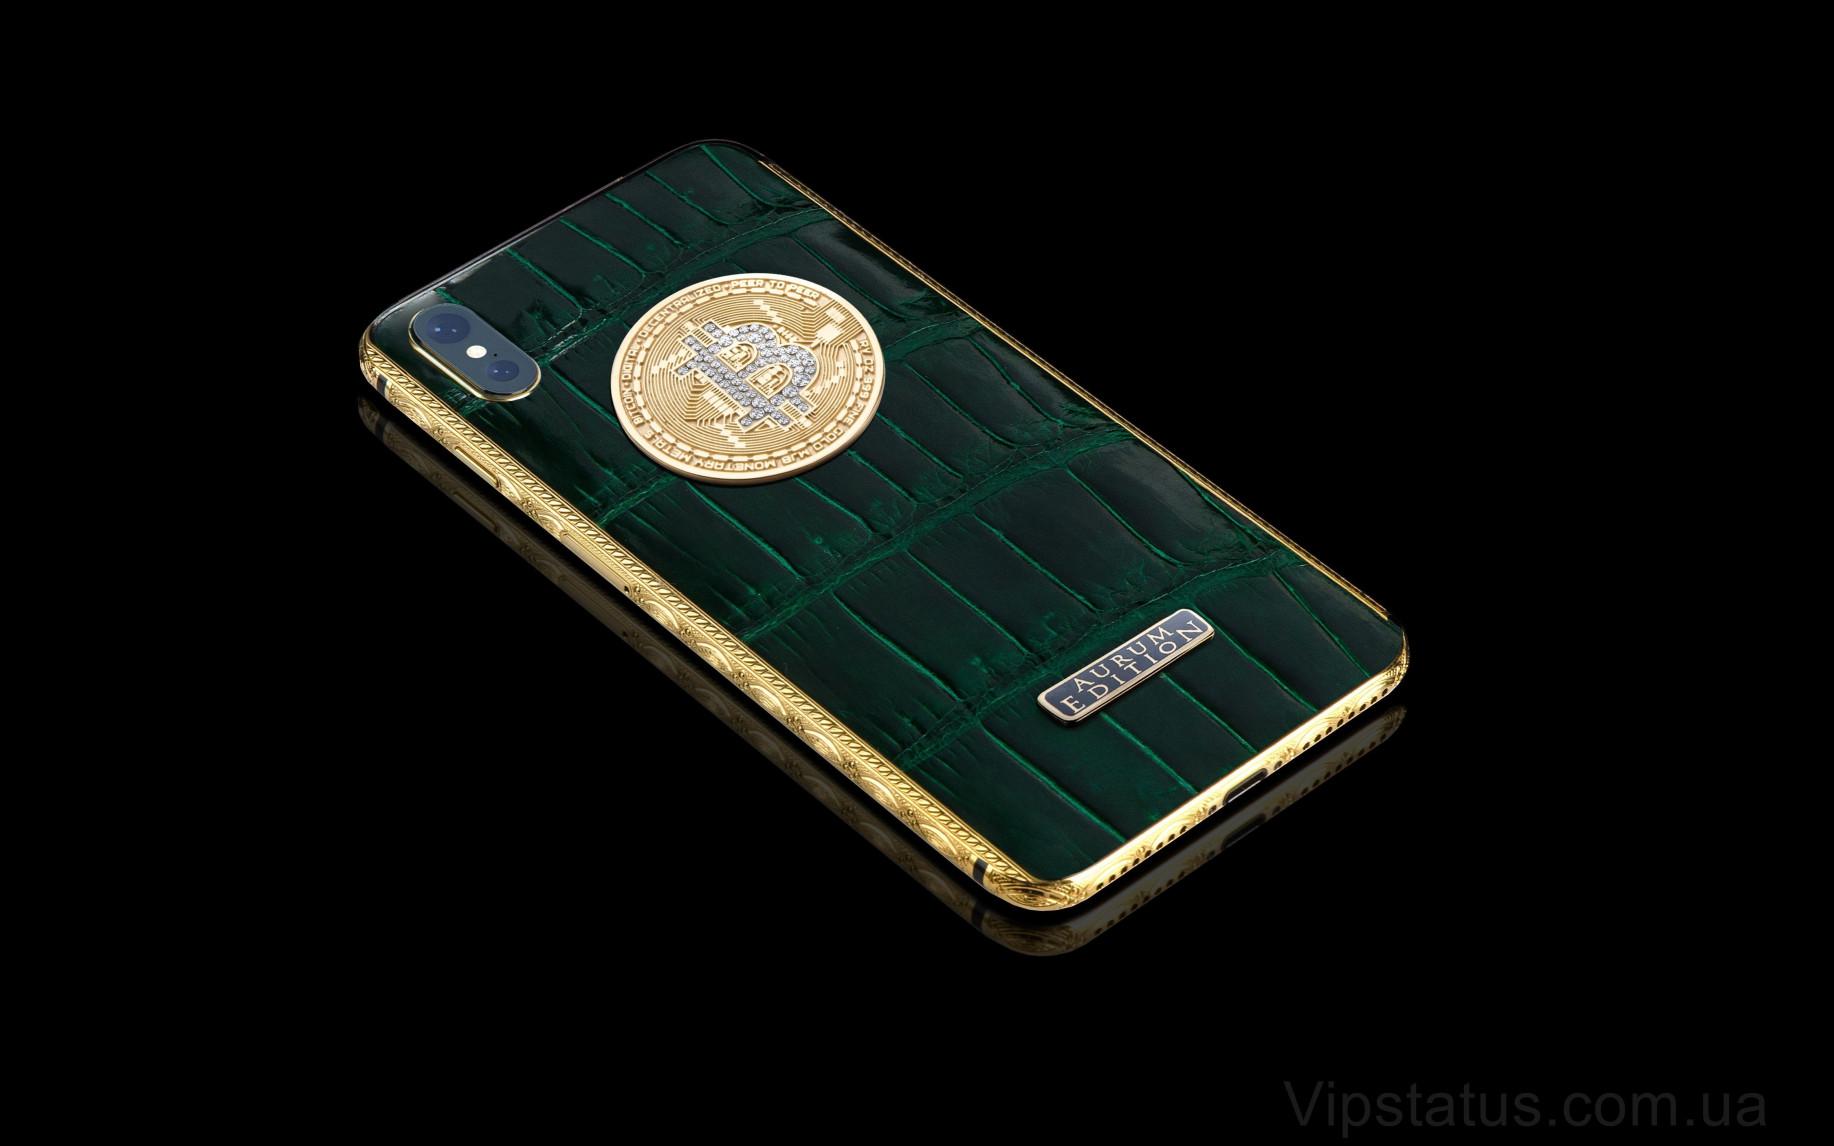 Elite Great Bitcoin Diamond IPHONE XS 512 GB Great Bitcoin Diamond IPHONE XS 512 GB image 2